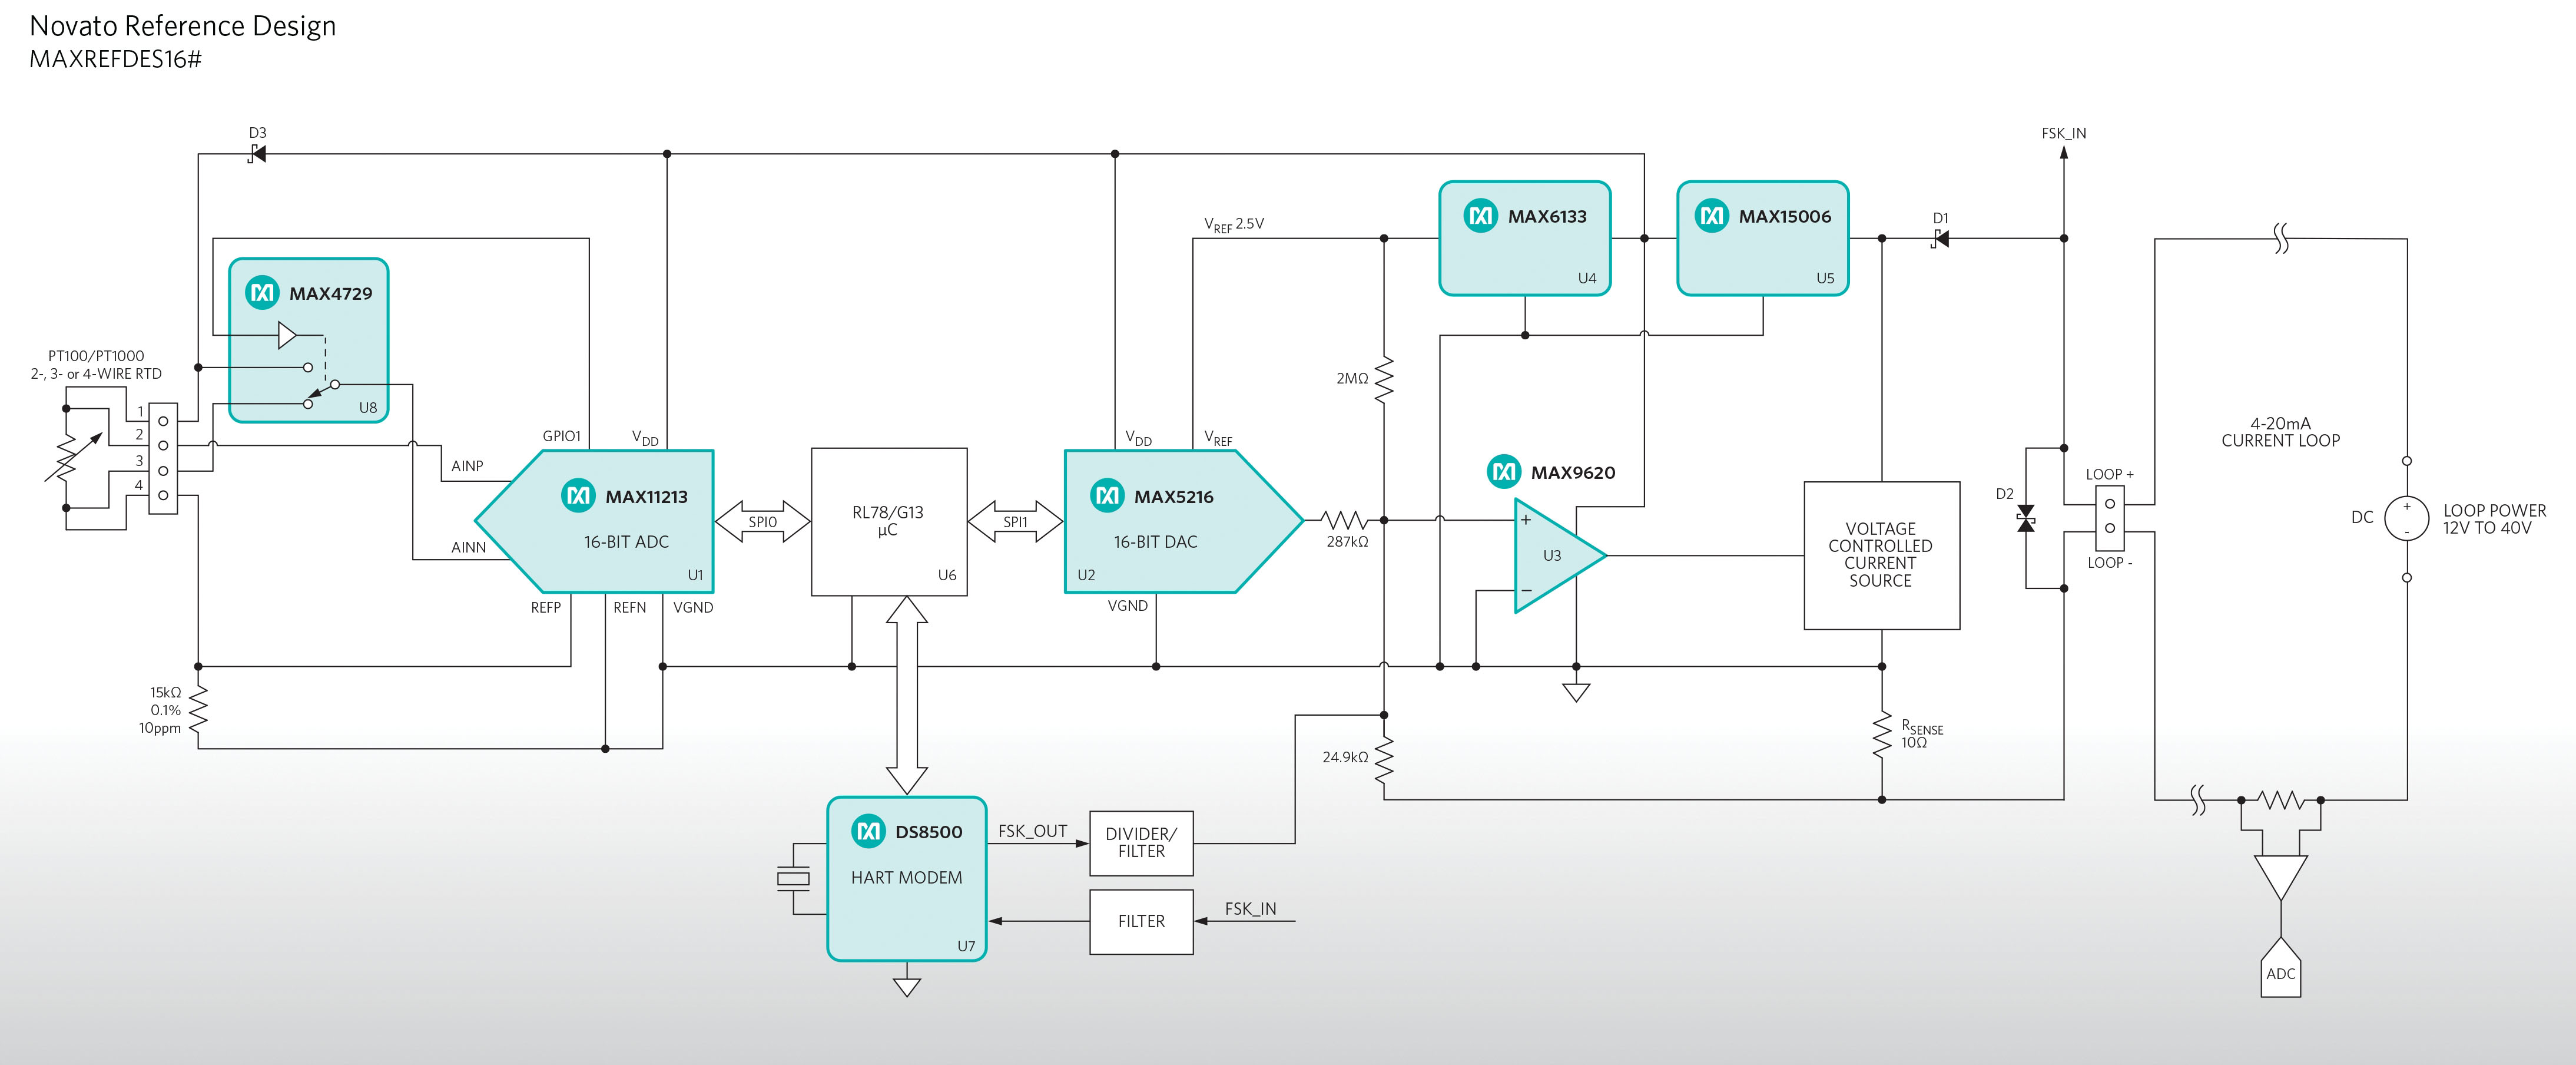 Referenzdesign Novato von Maxim Integrated mit HART-Protokoll ...